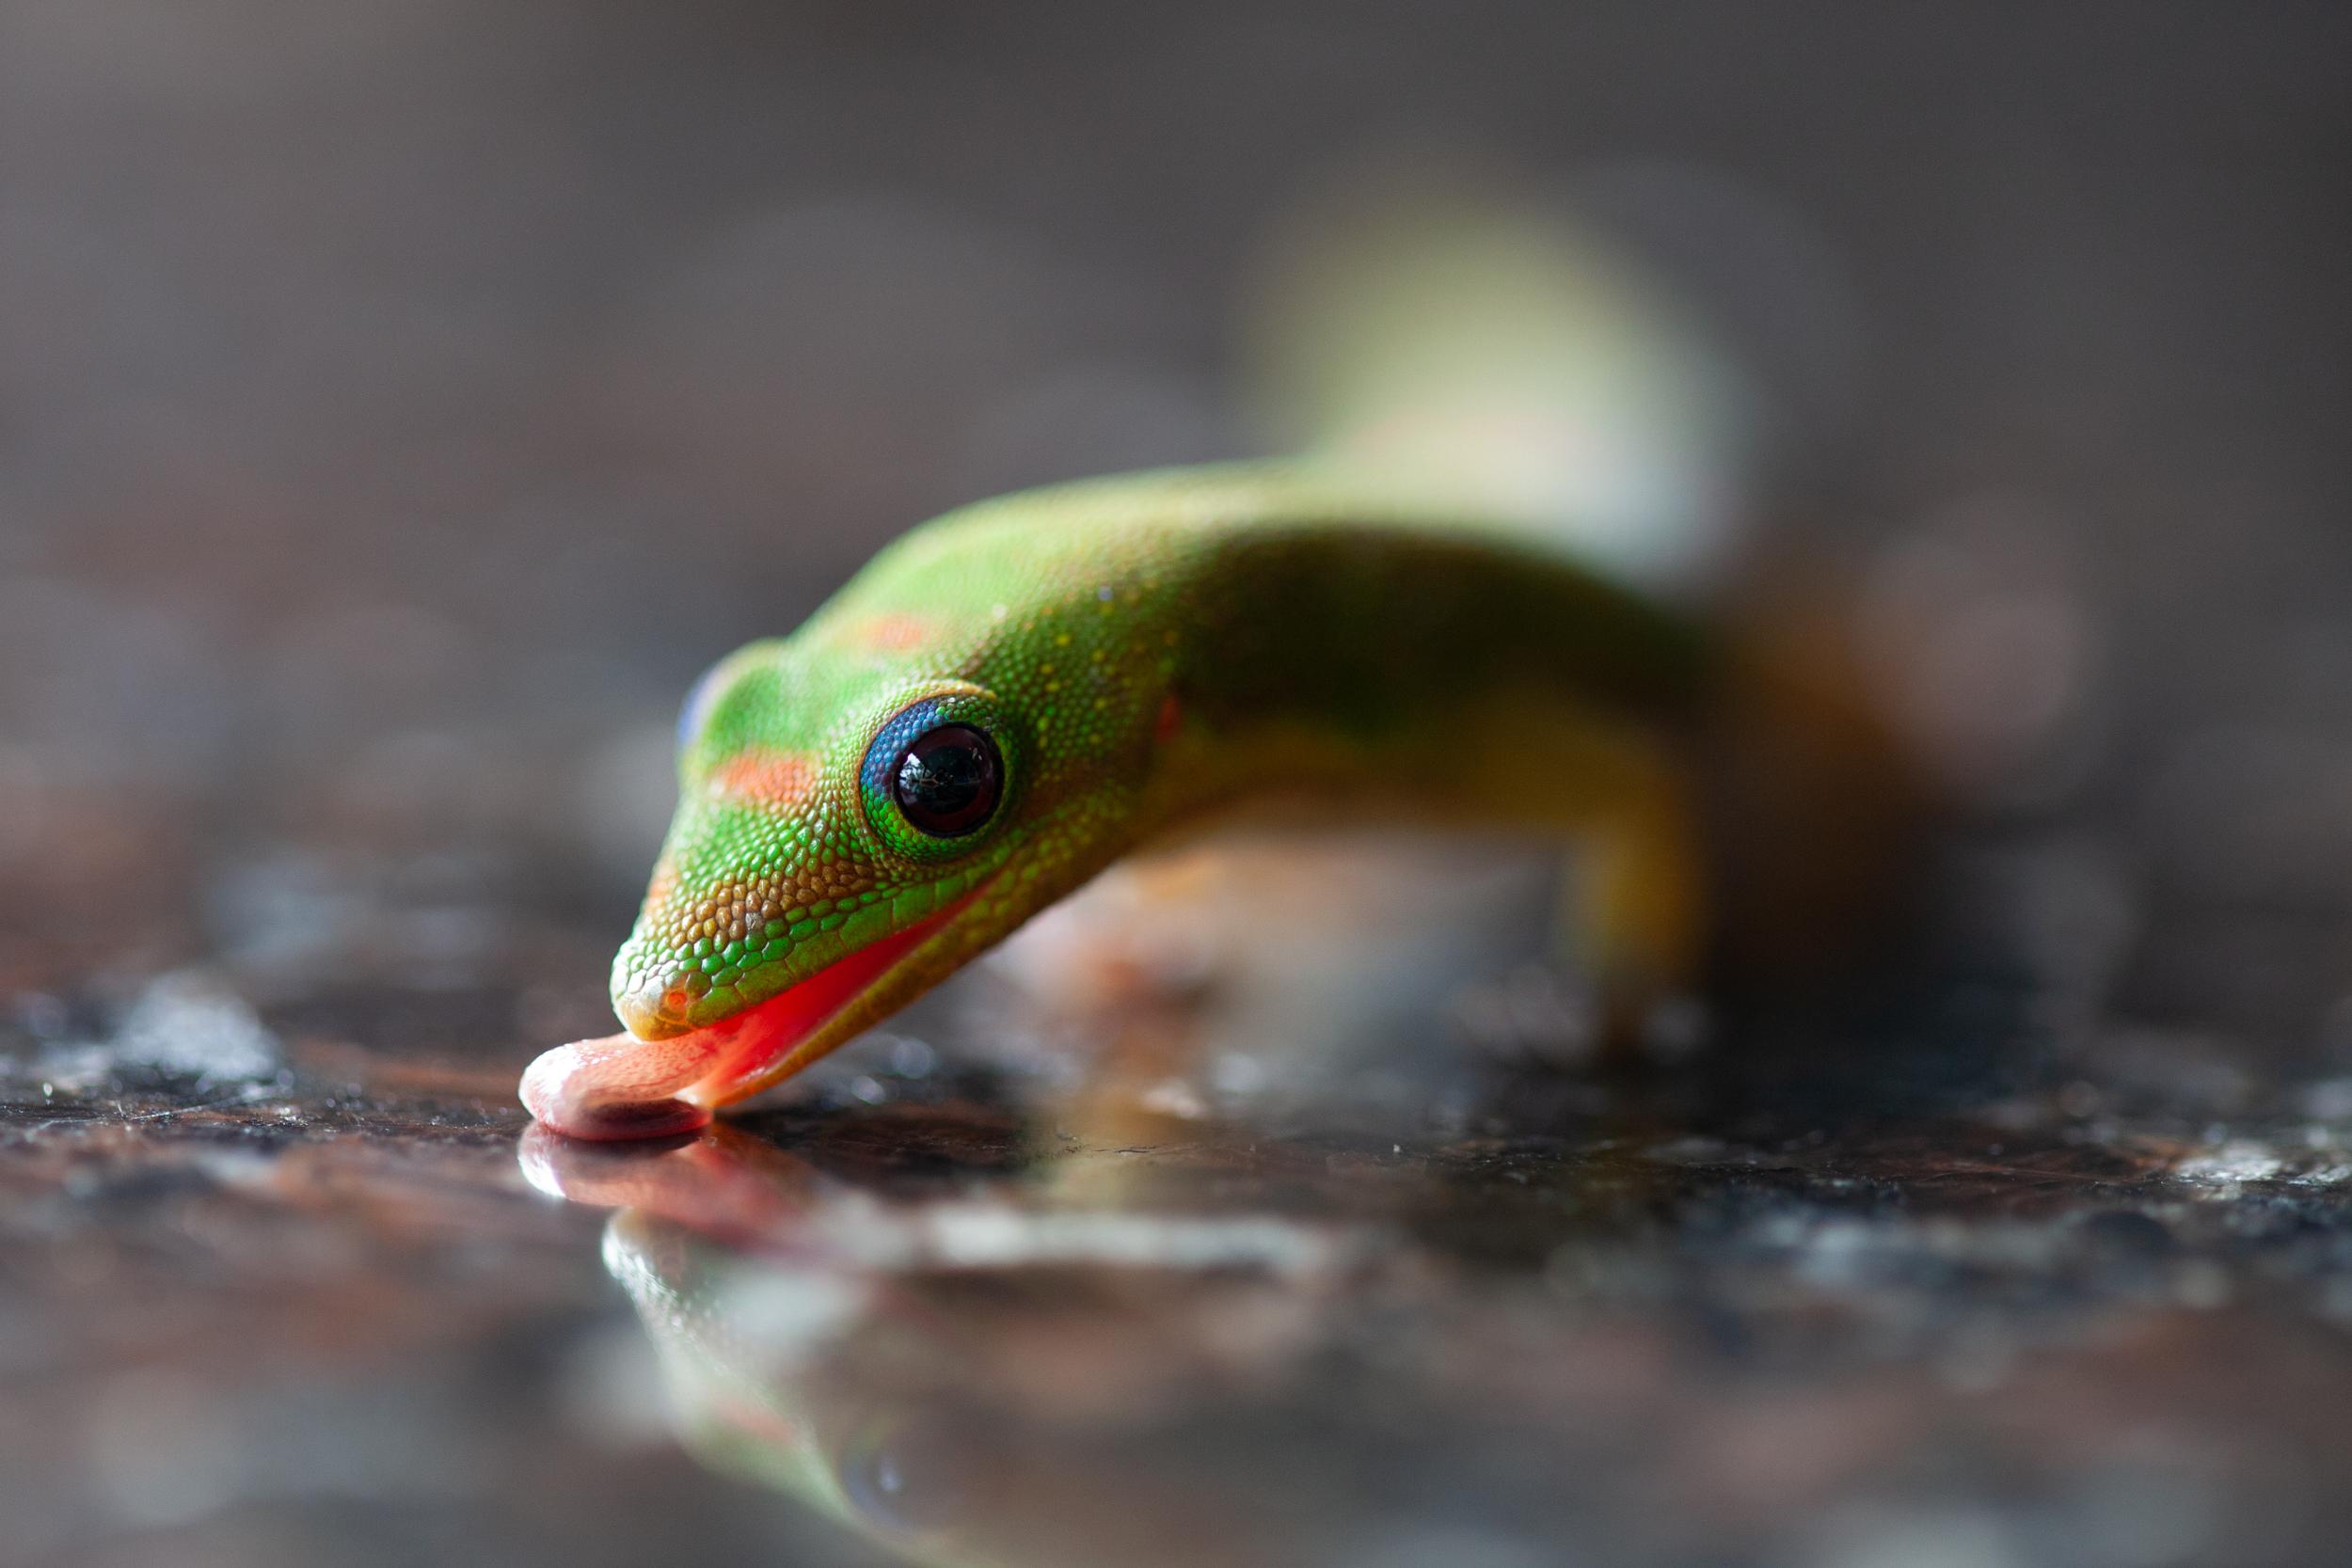 gecko_tongue_leila_chieko.jpg